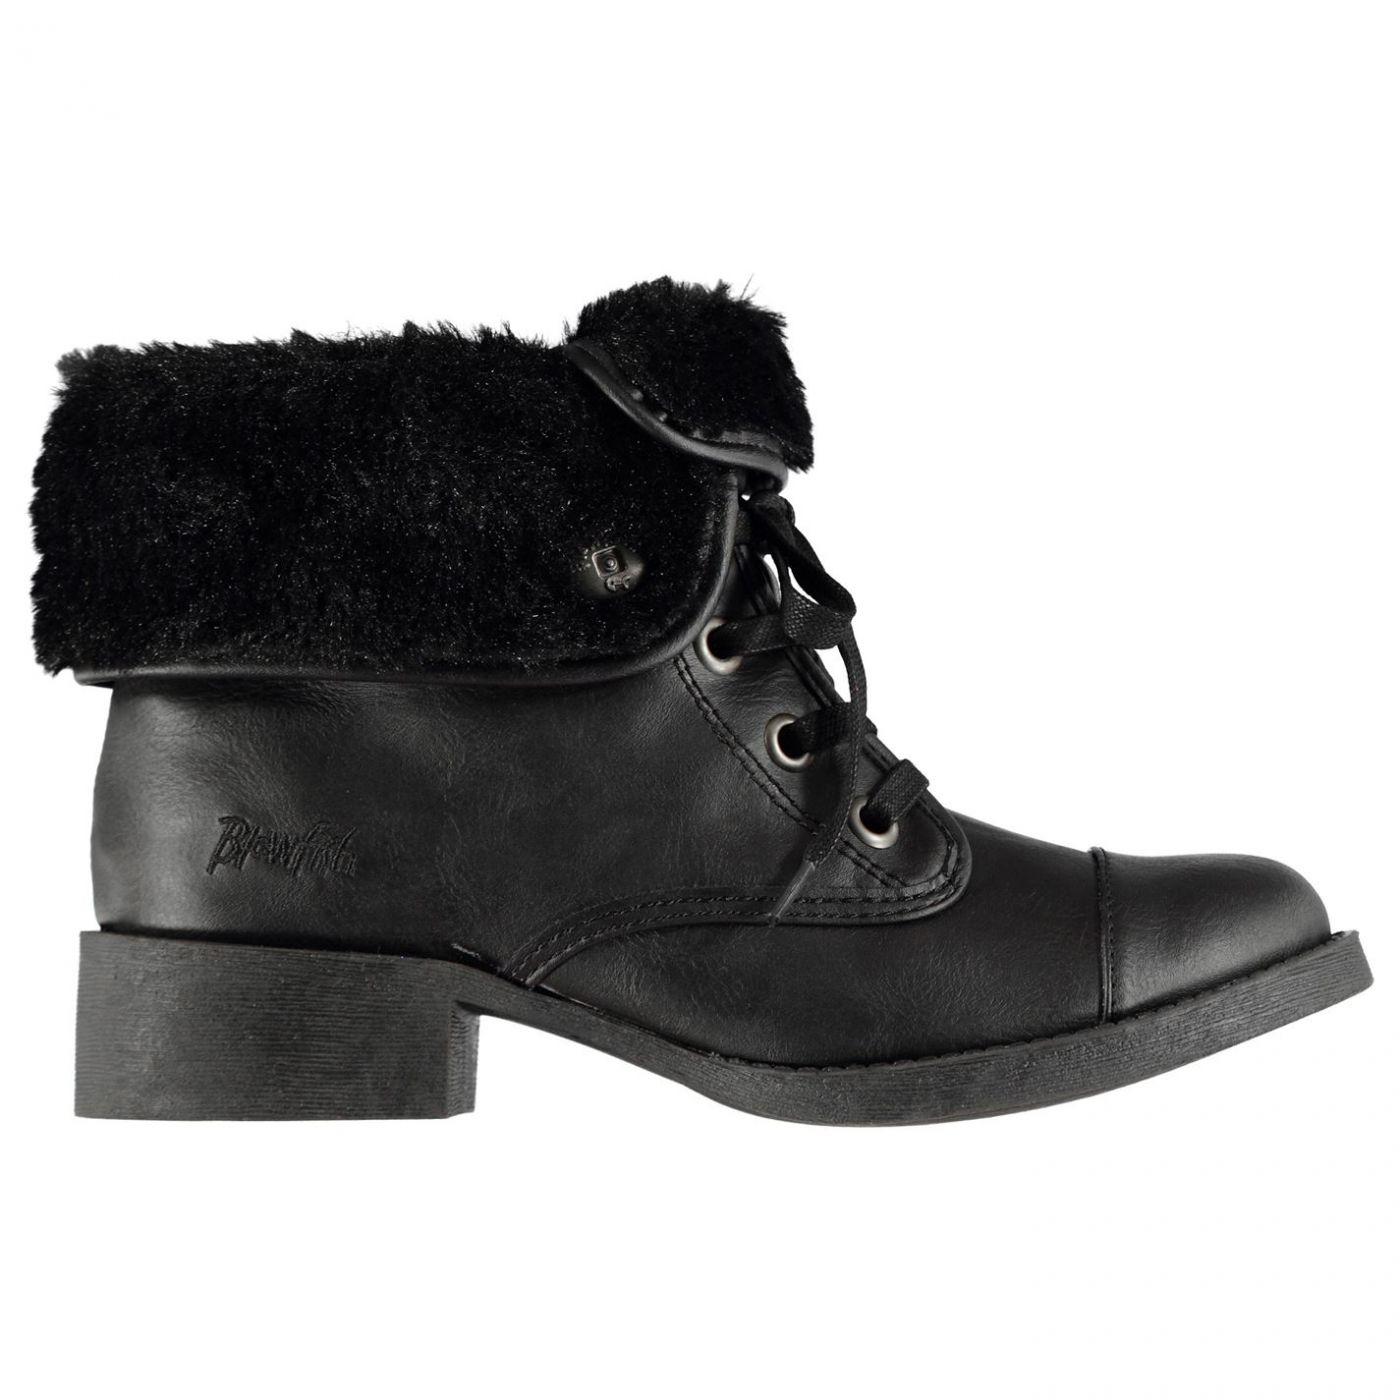 Blowfish Karona Ankle Boots